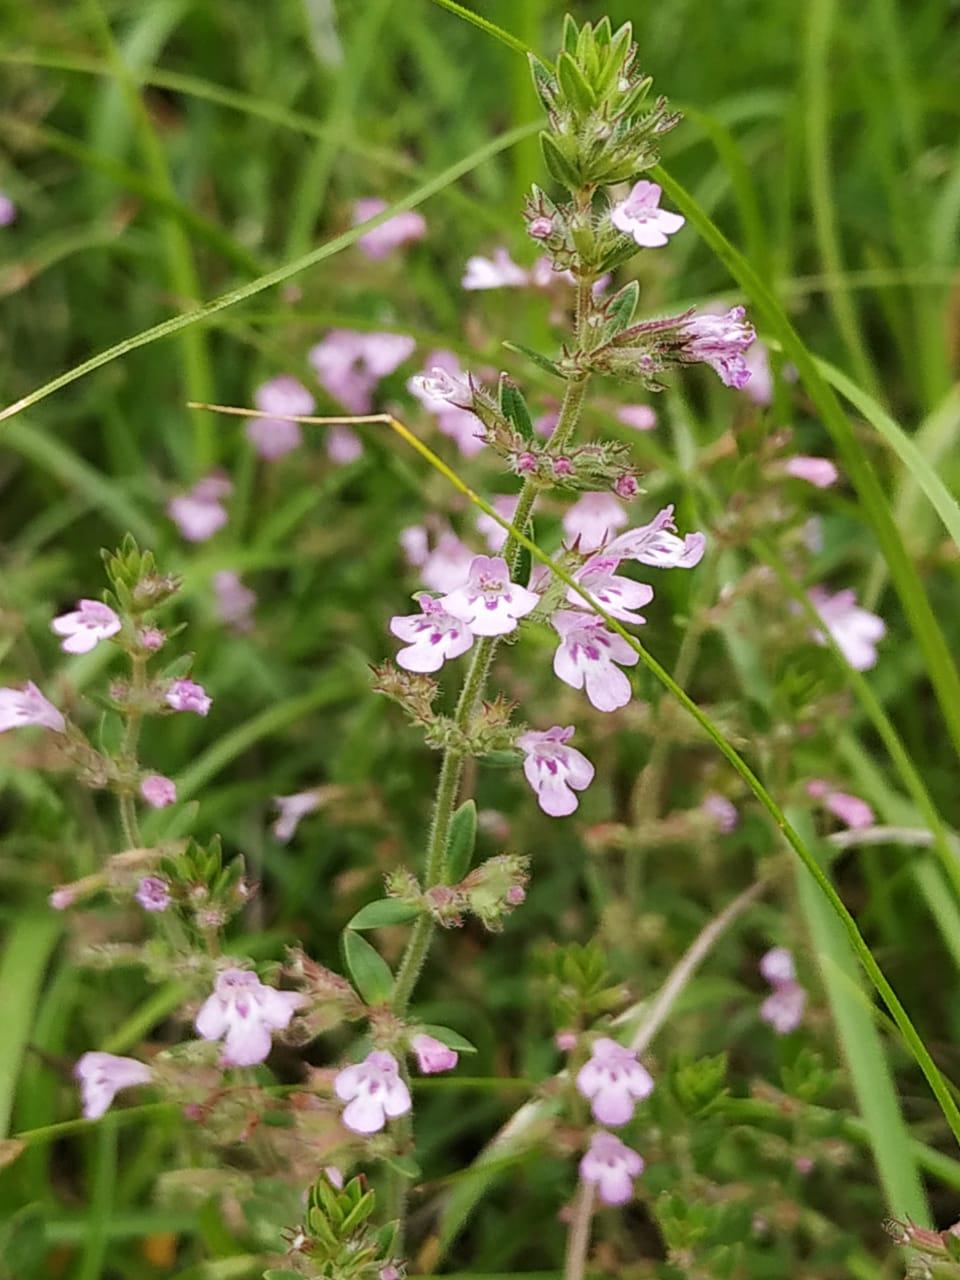 Micromeria biflora (Buch.-Ham. ex D. Don.) Benth.- Pushanbanda (पूषनबंदा)